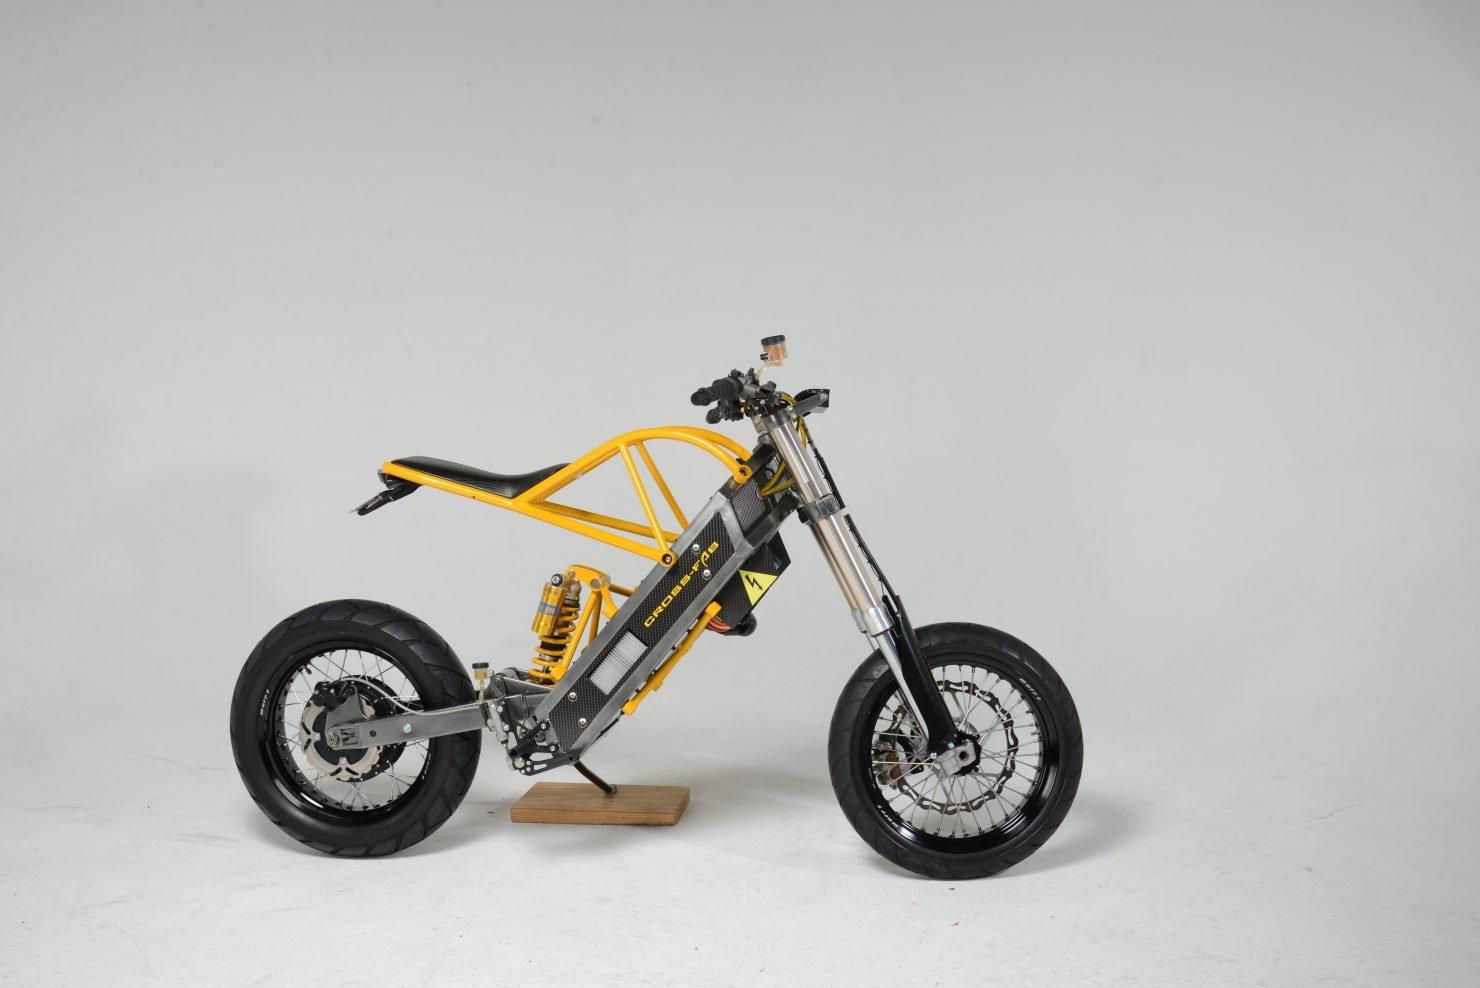 ExoDyne Electric Motorcycle 7 1480x988 - ExoDyne Electric Motorcycle